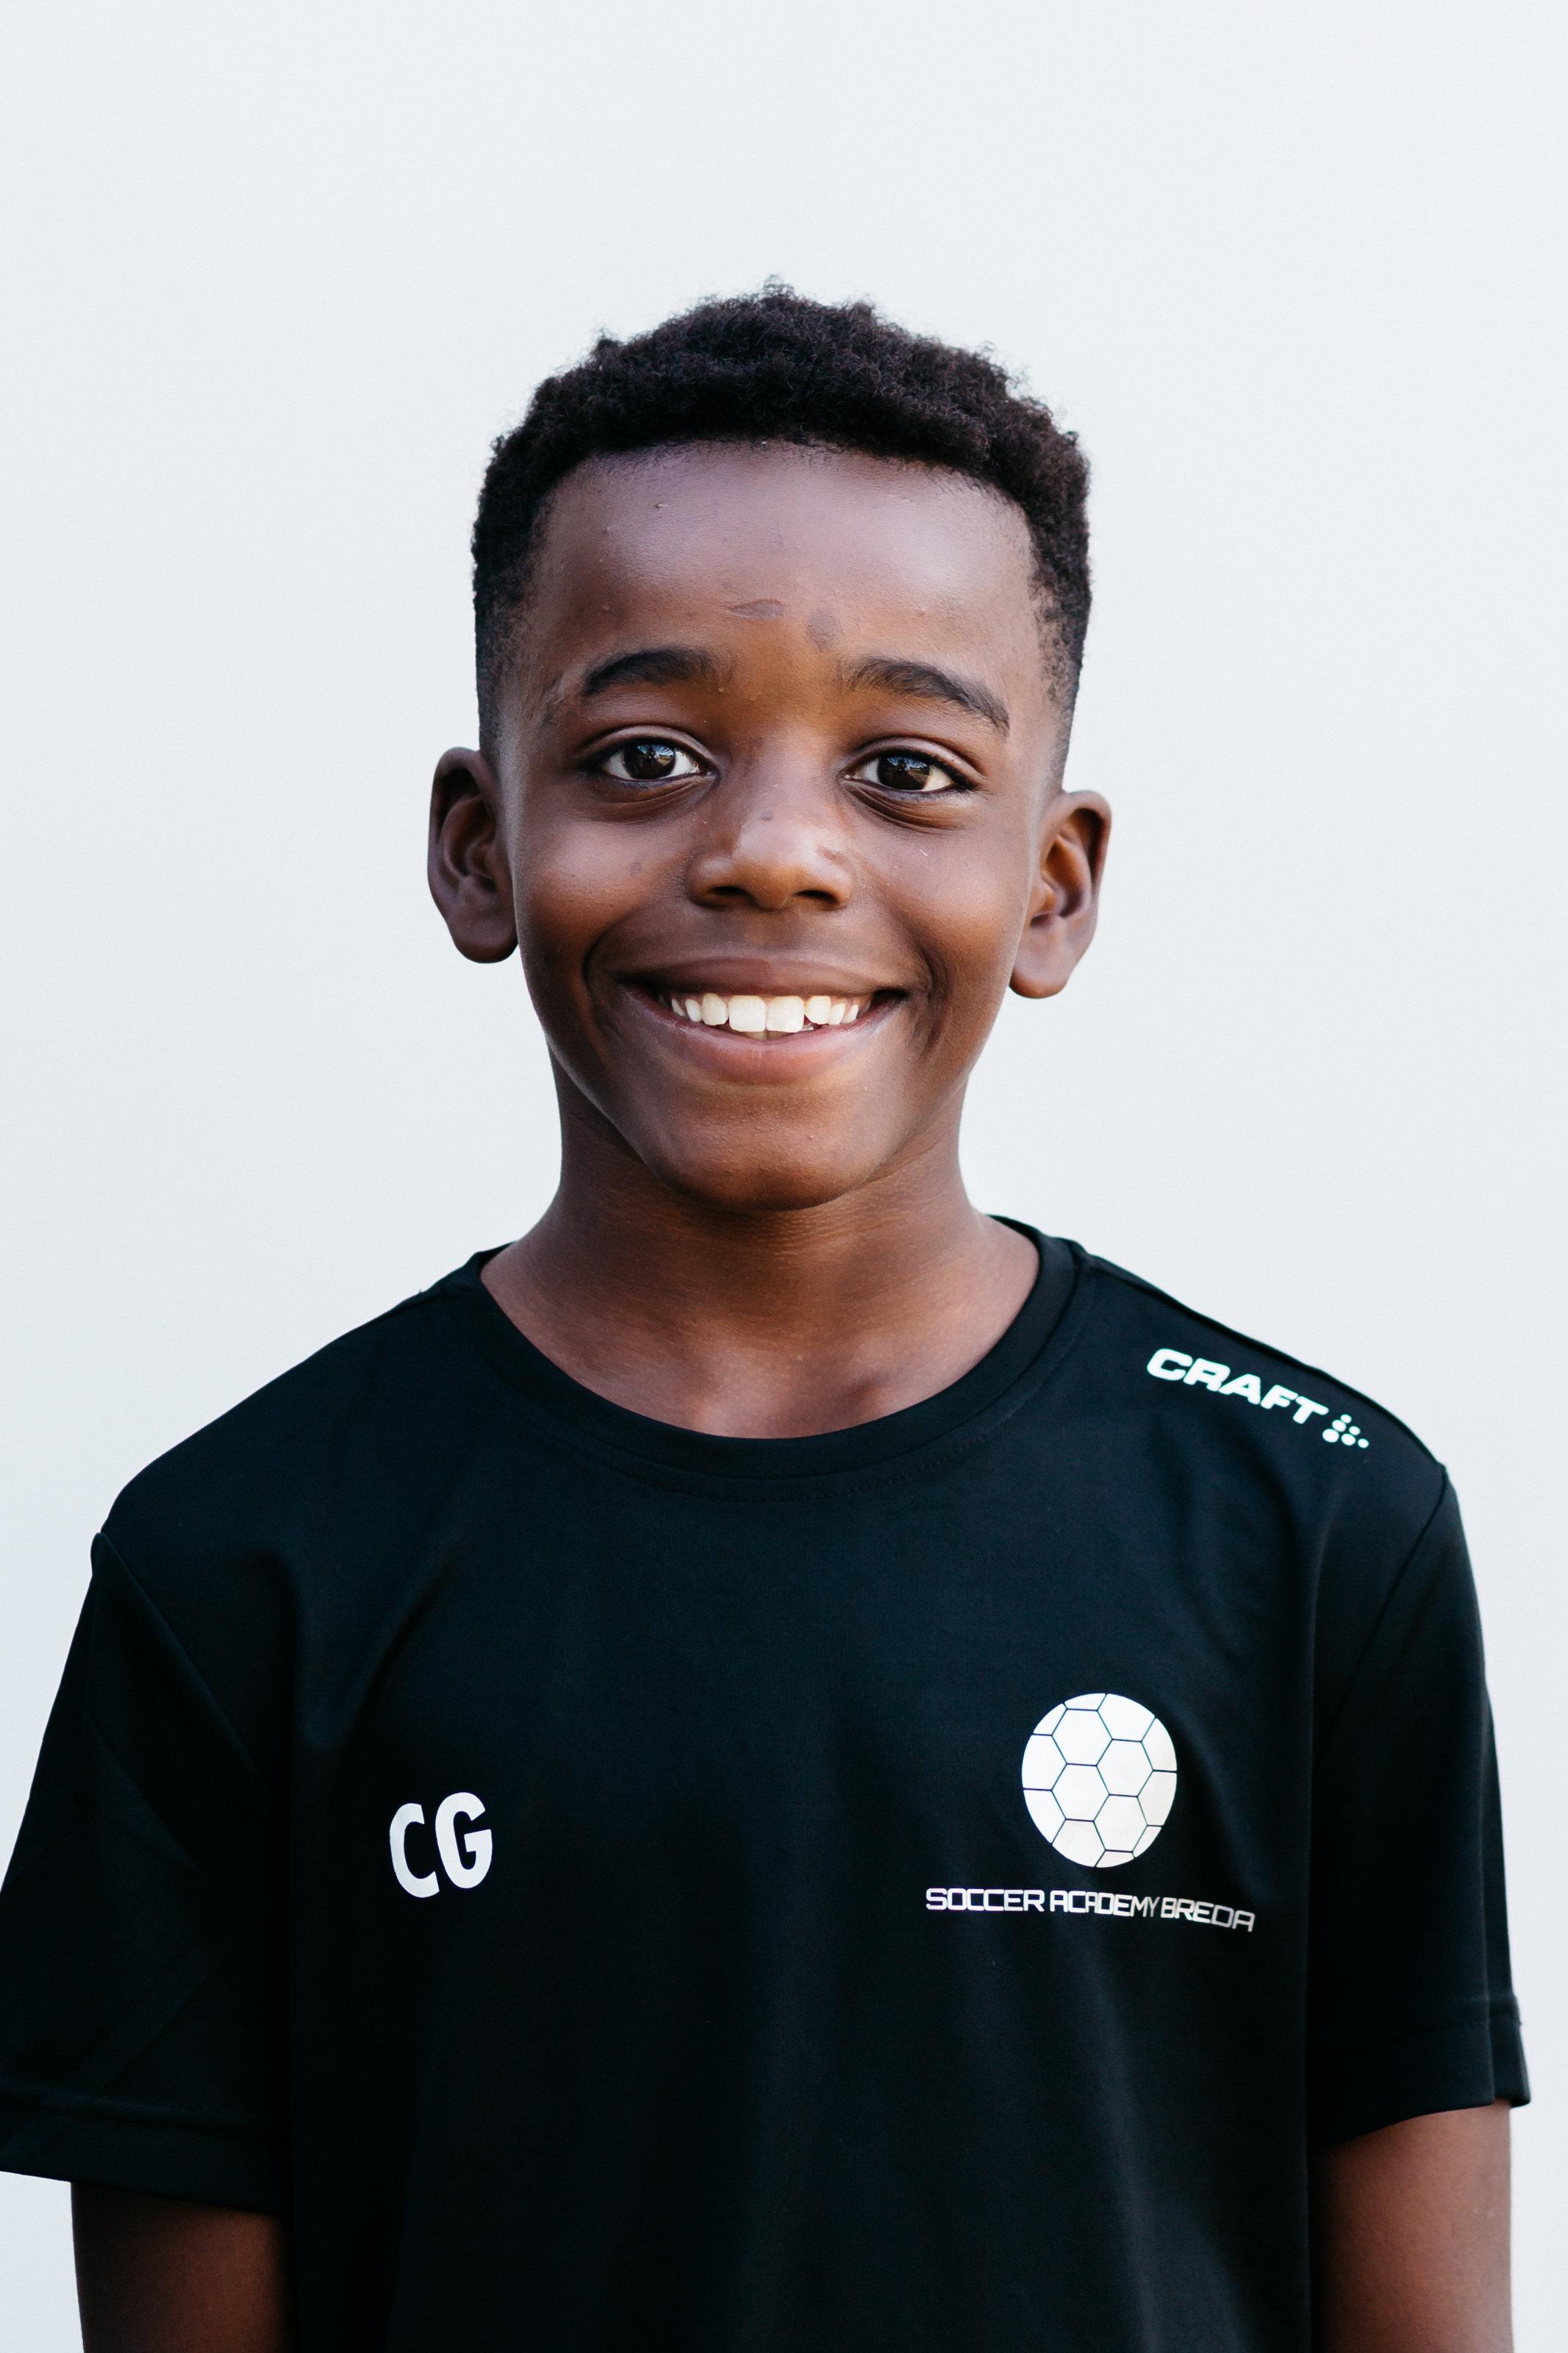 https://socceracademybreda.nl/wp-content/uploads/2020/10/Caleb.jpg